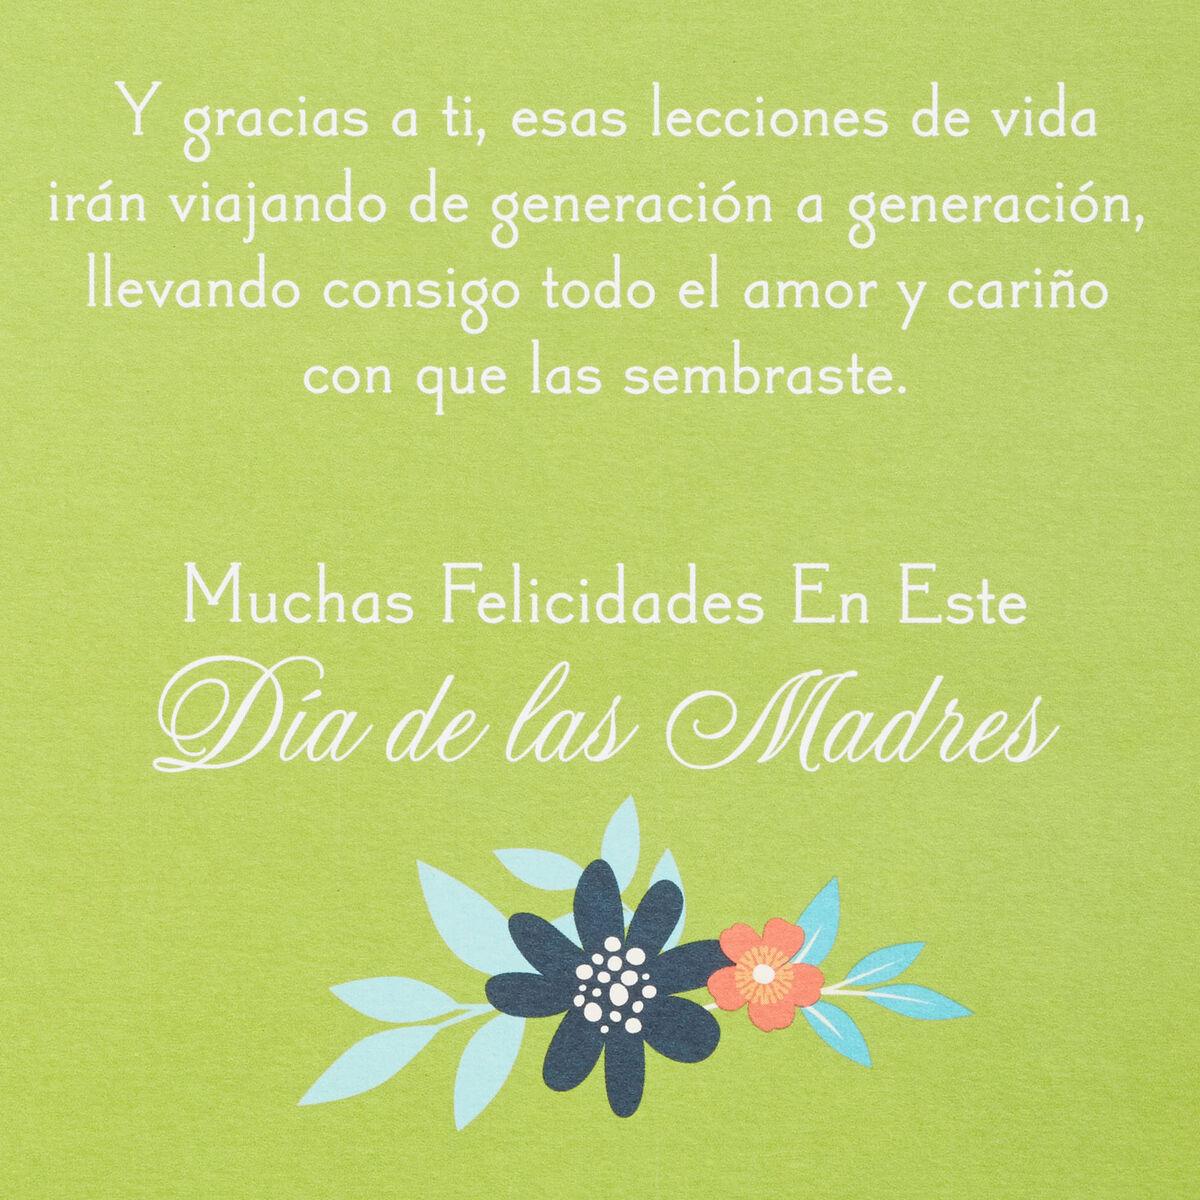 abuela you are beautiful spanishlanguage mother's day